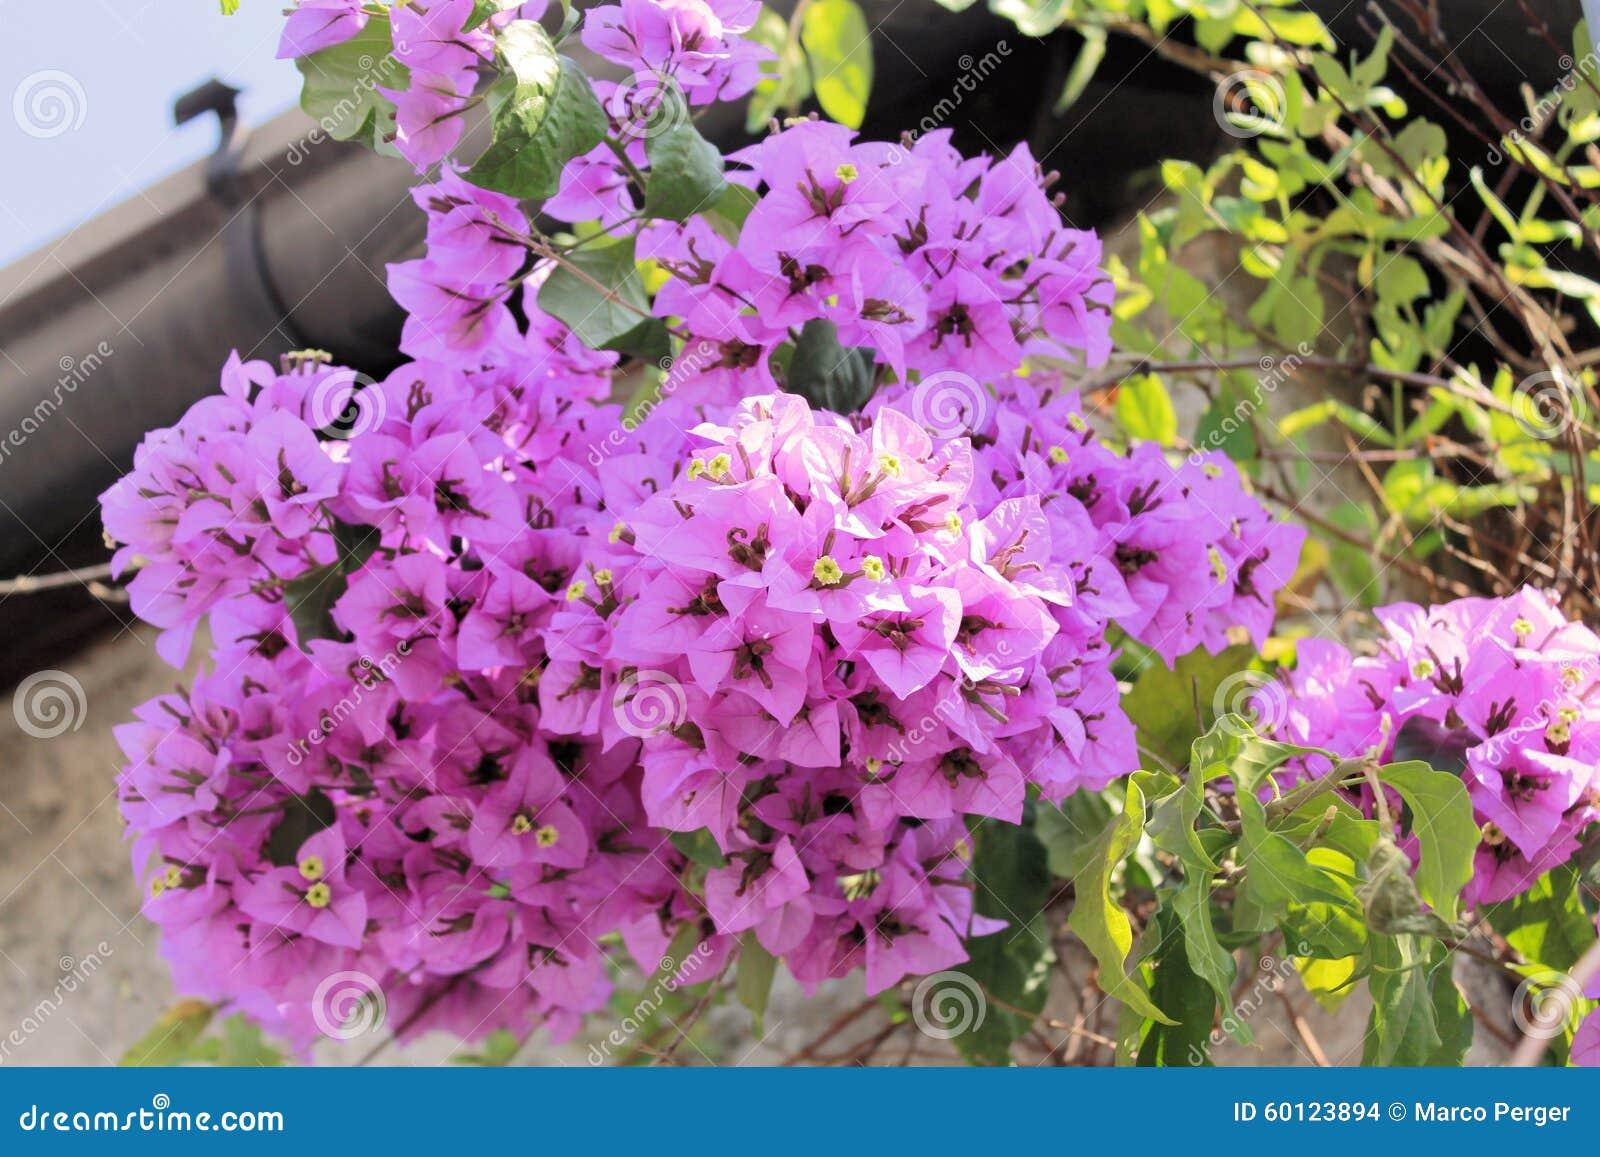 Bougainvillea stock photo  Image of floral, plants, elegance